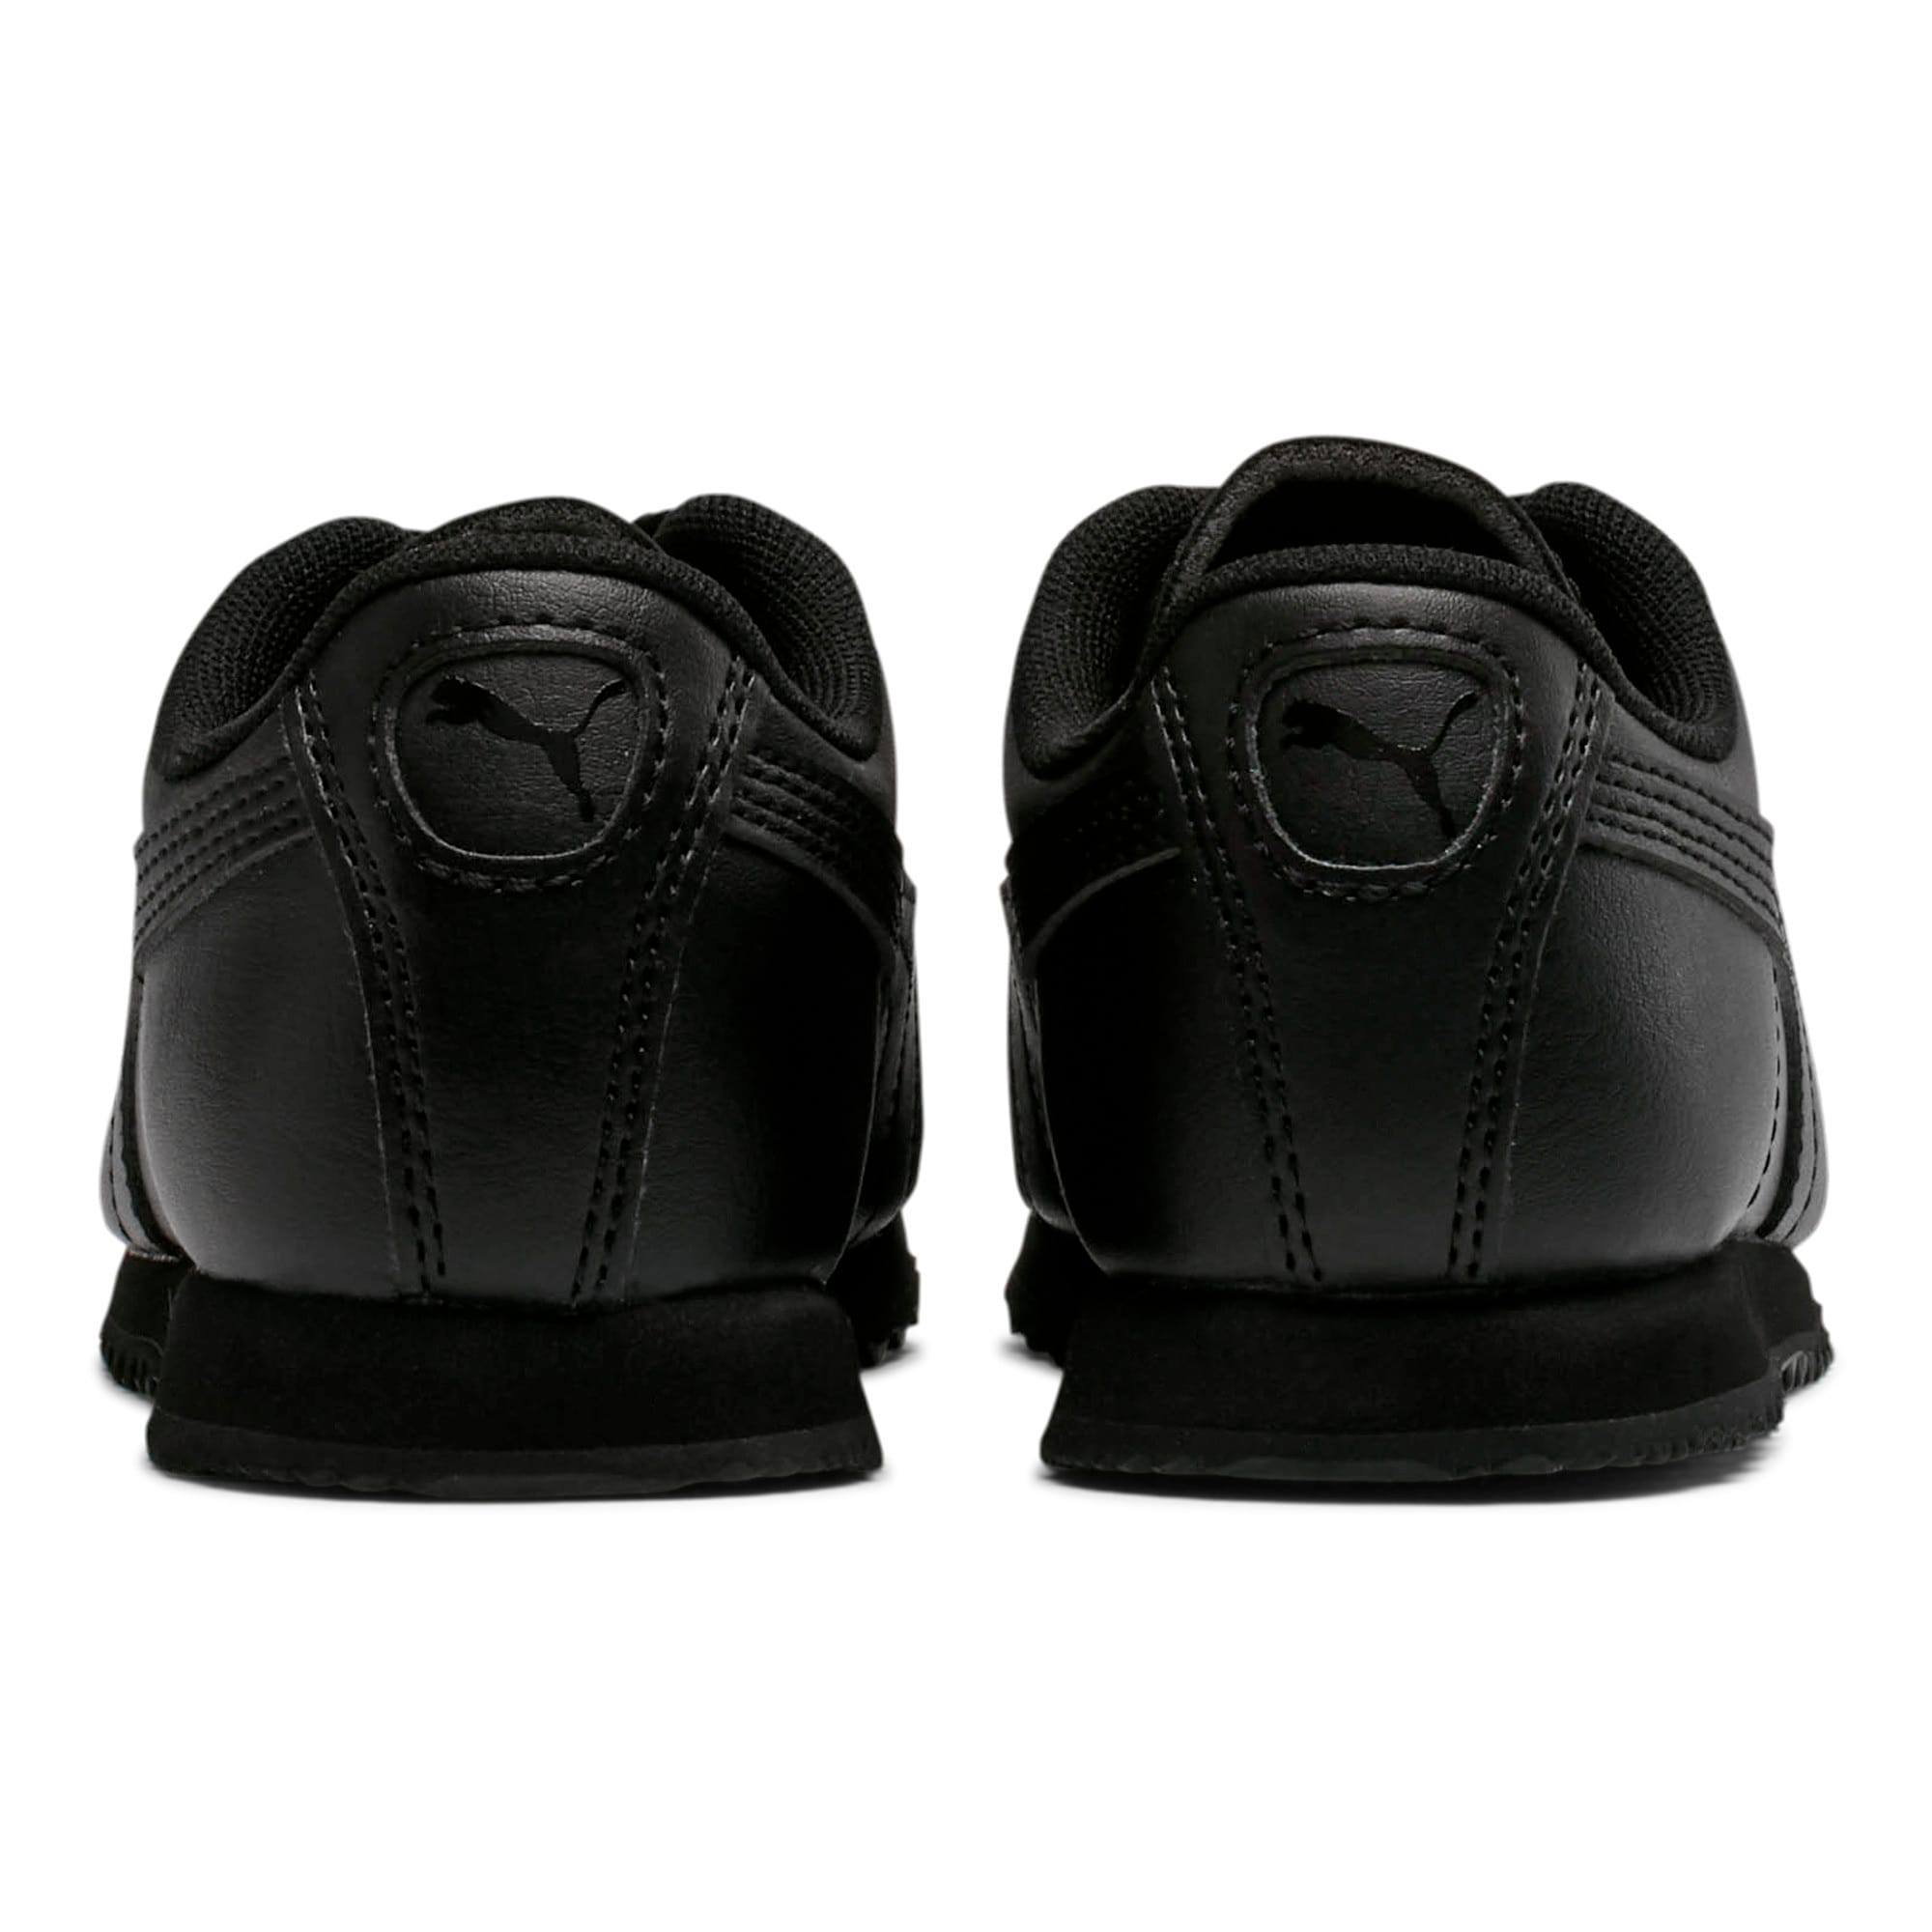 Thumbnail 4 of Roma Basic Little Kids' Shoes, Puma Black-Puma Black, medium